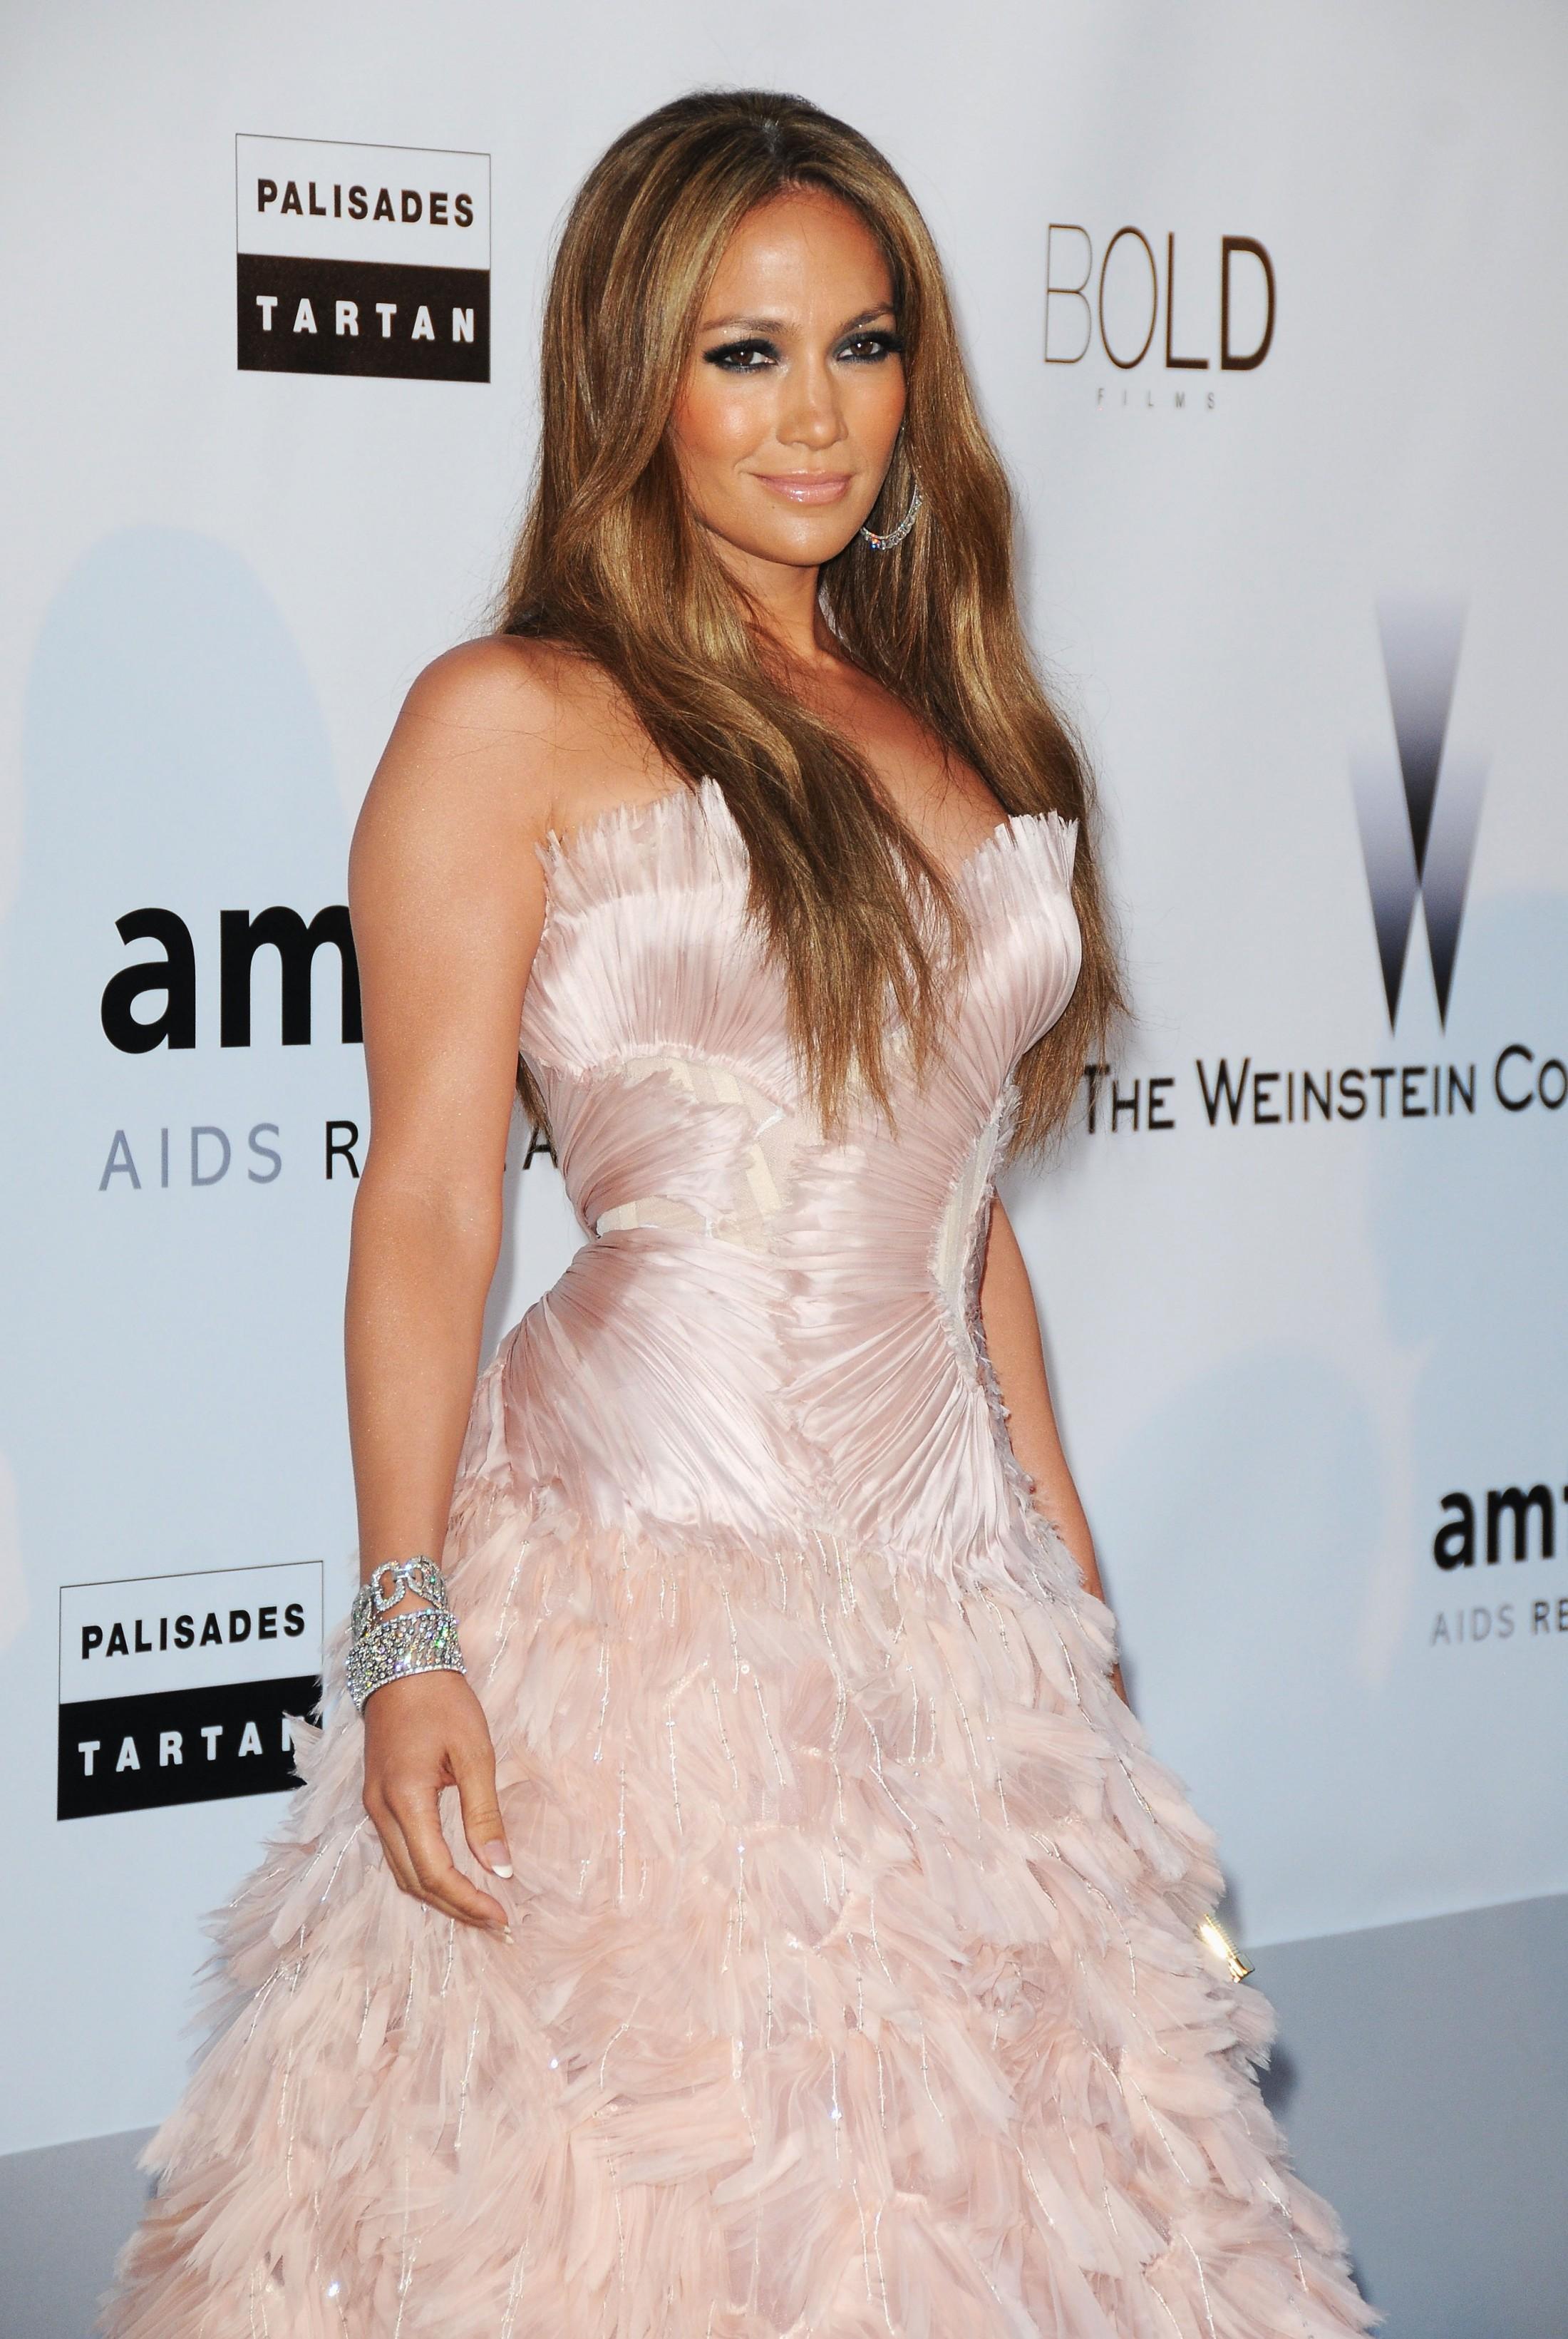 Jennifer Lopez 2010 : jennifer-lopez-at-amfars-cinema-against-aids-2010-benefit-gala-02